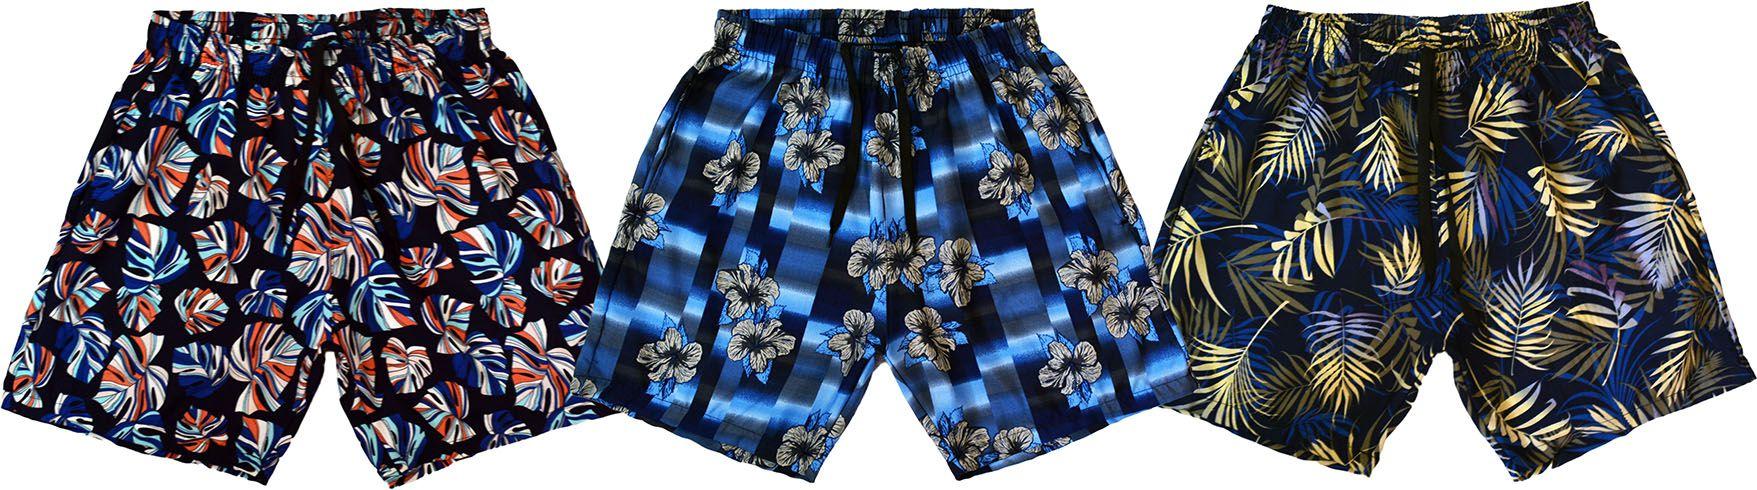 KIT 3 Shorts Masculino Praia Microfibra Estampado Com Bolsos Laterais  Ref.386A.10 - Frent´s c2577bd688d5f